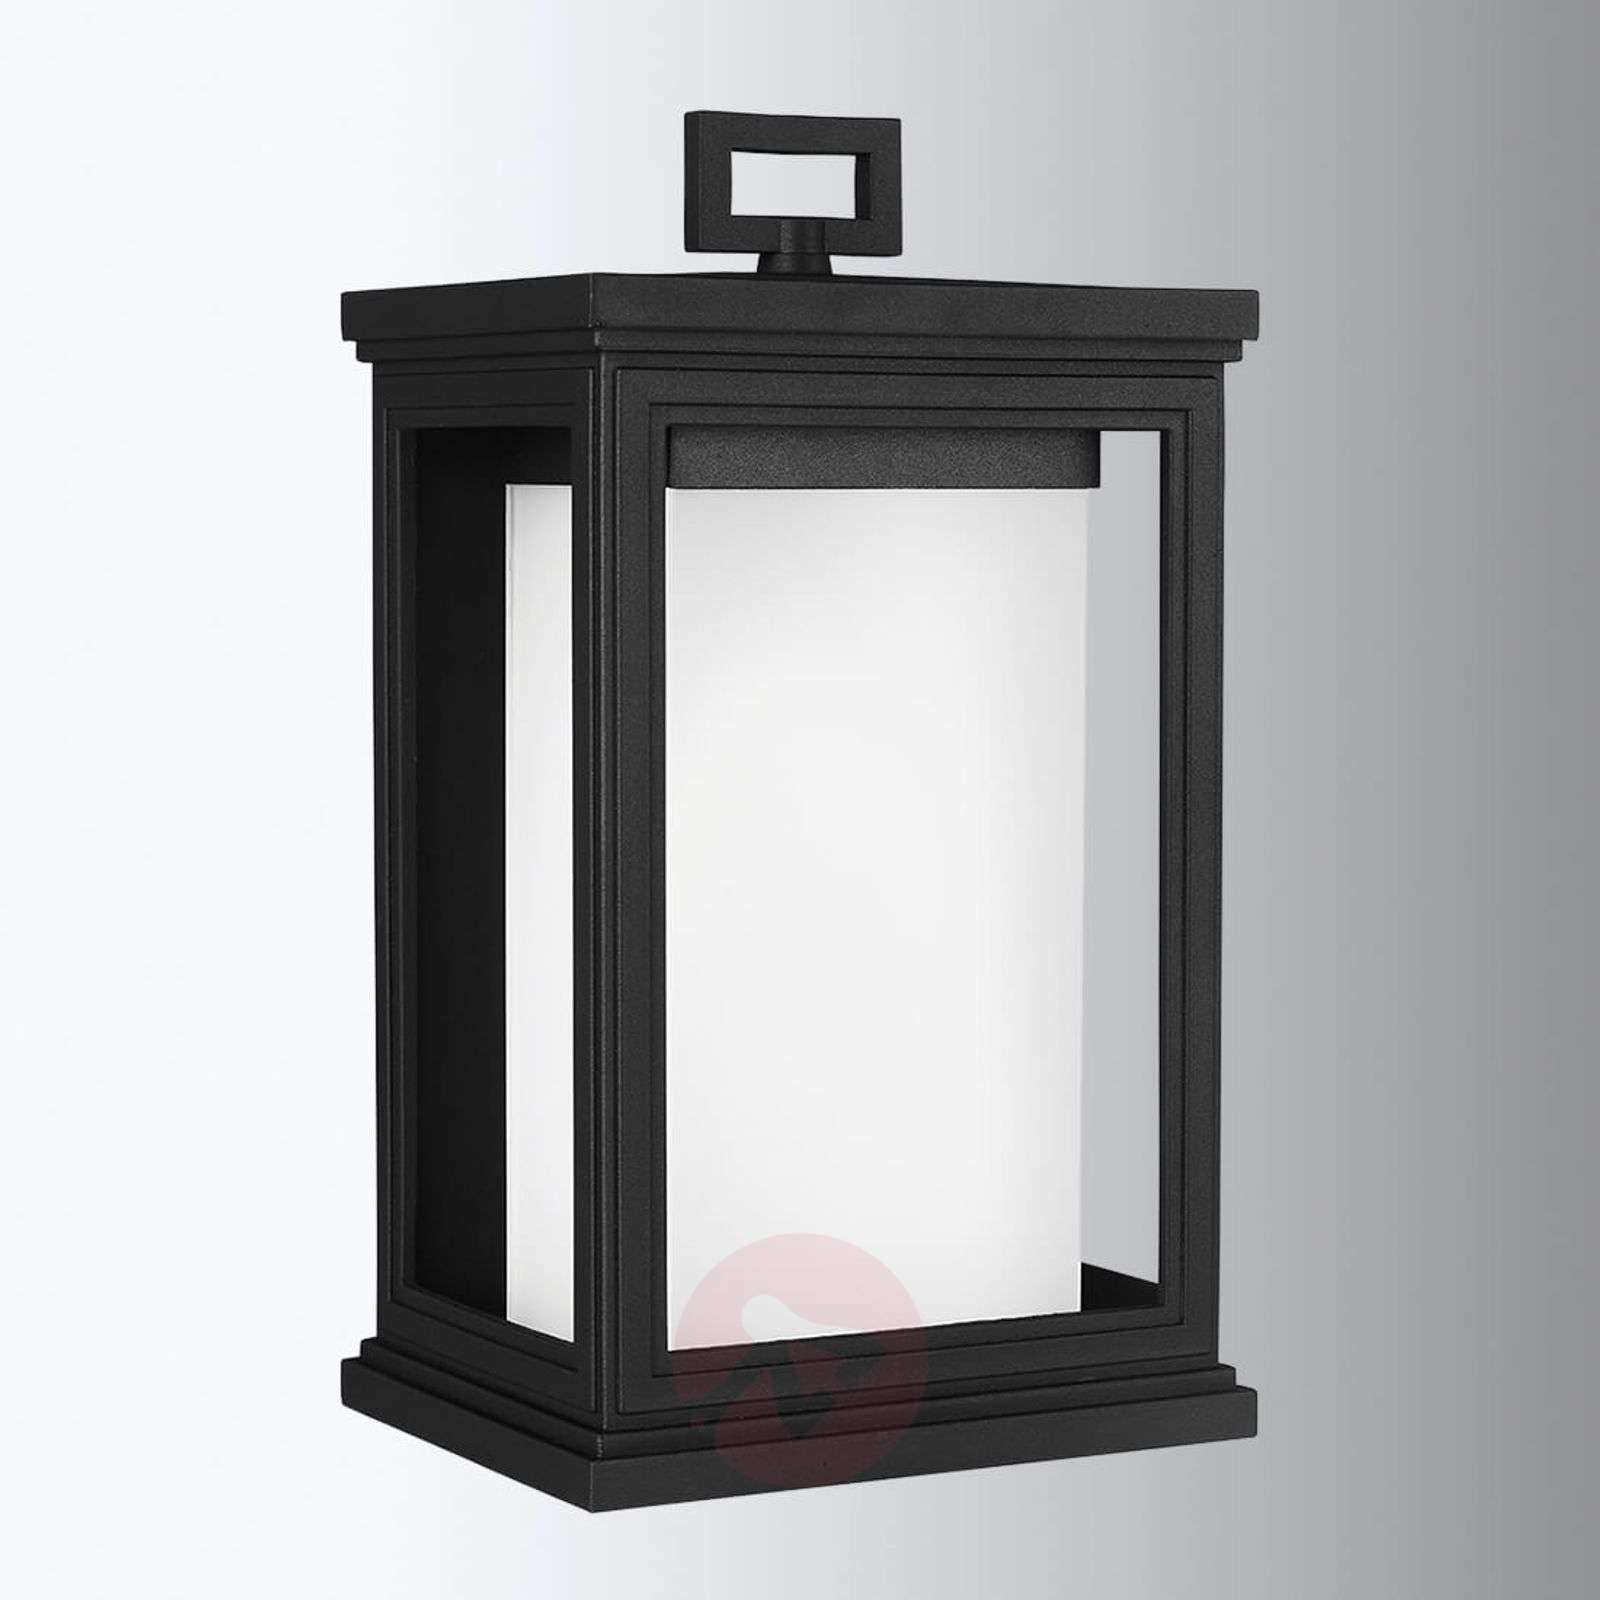 Medium Roscoe wall light for outdoor areas-3048836-01